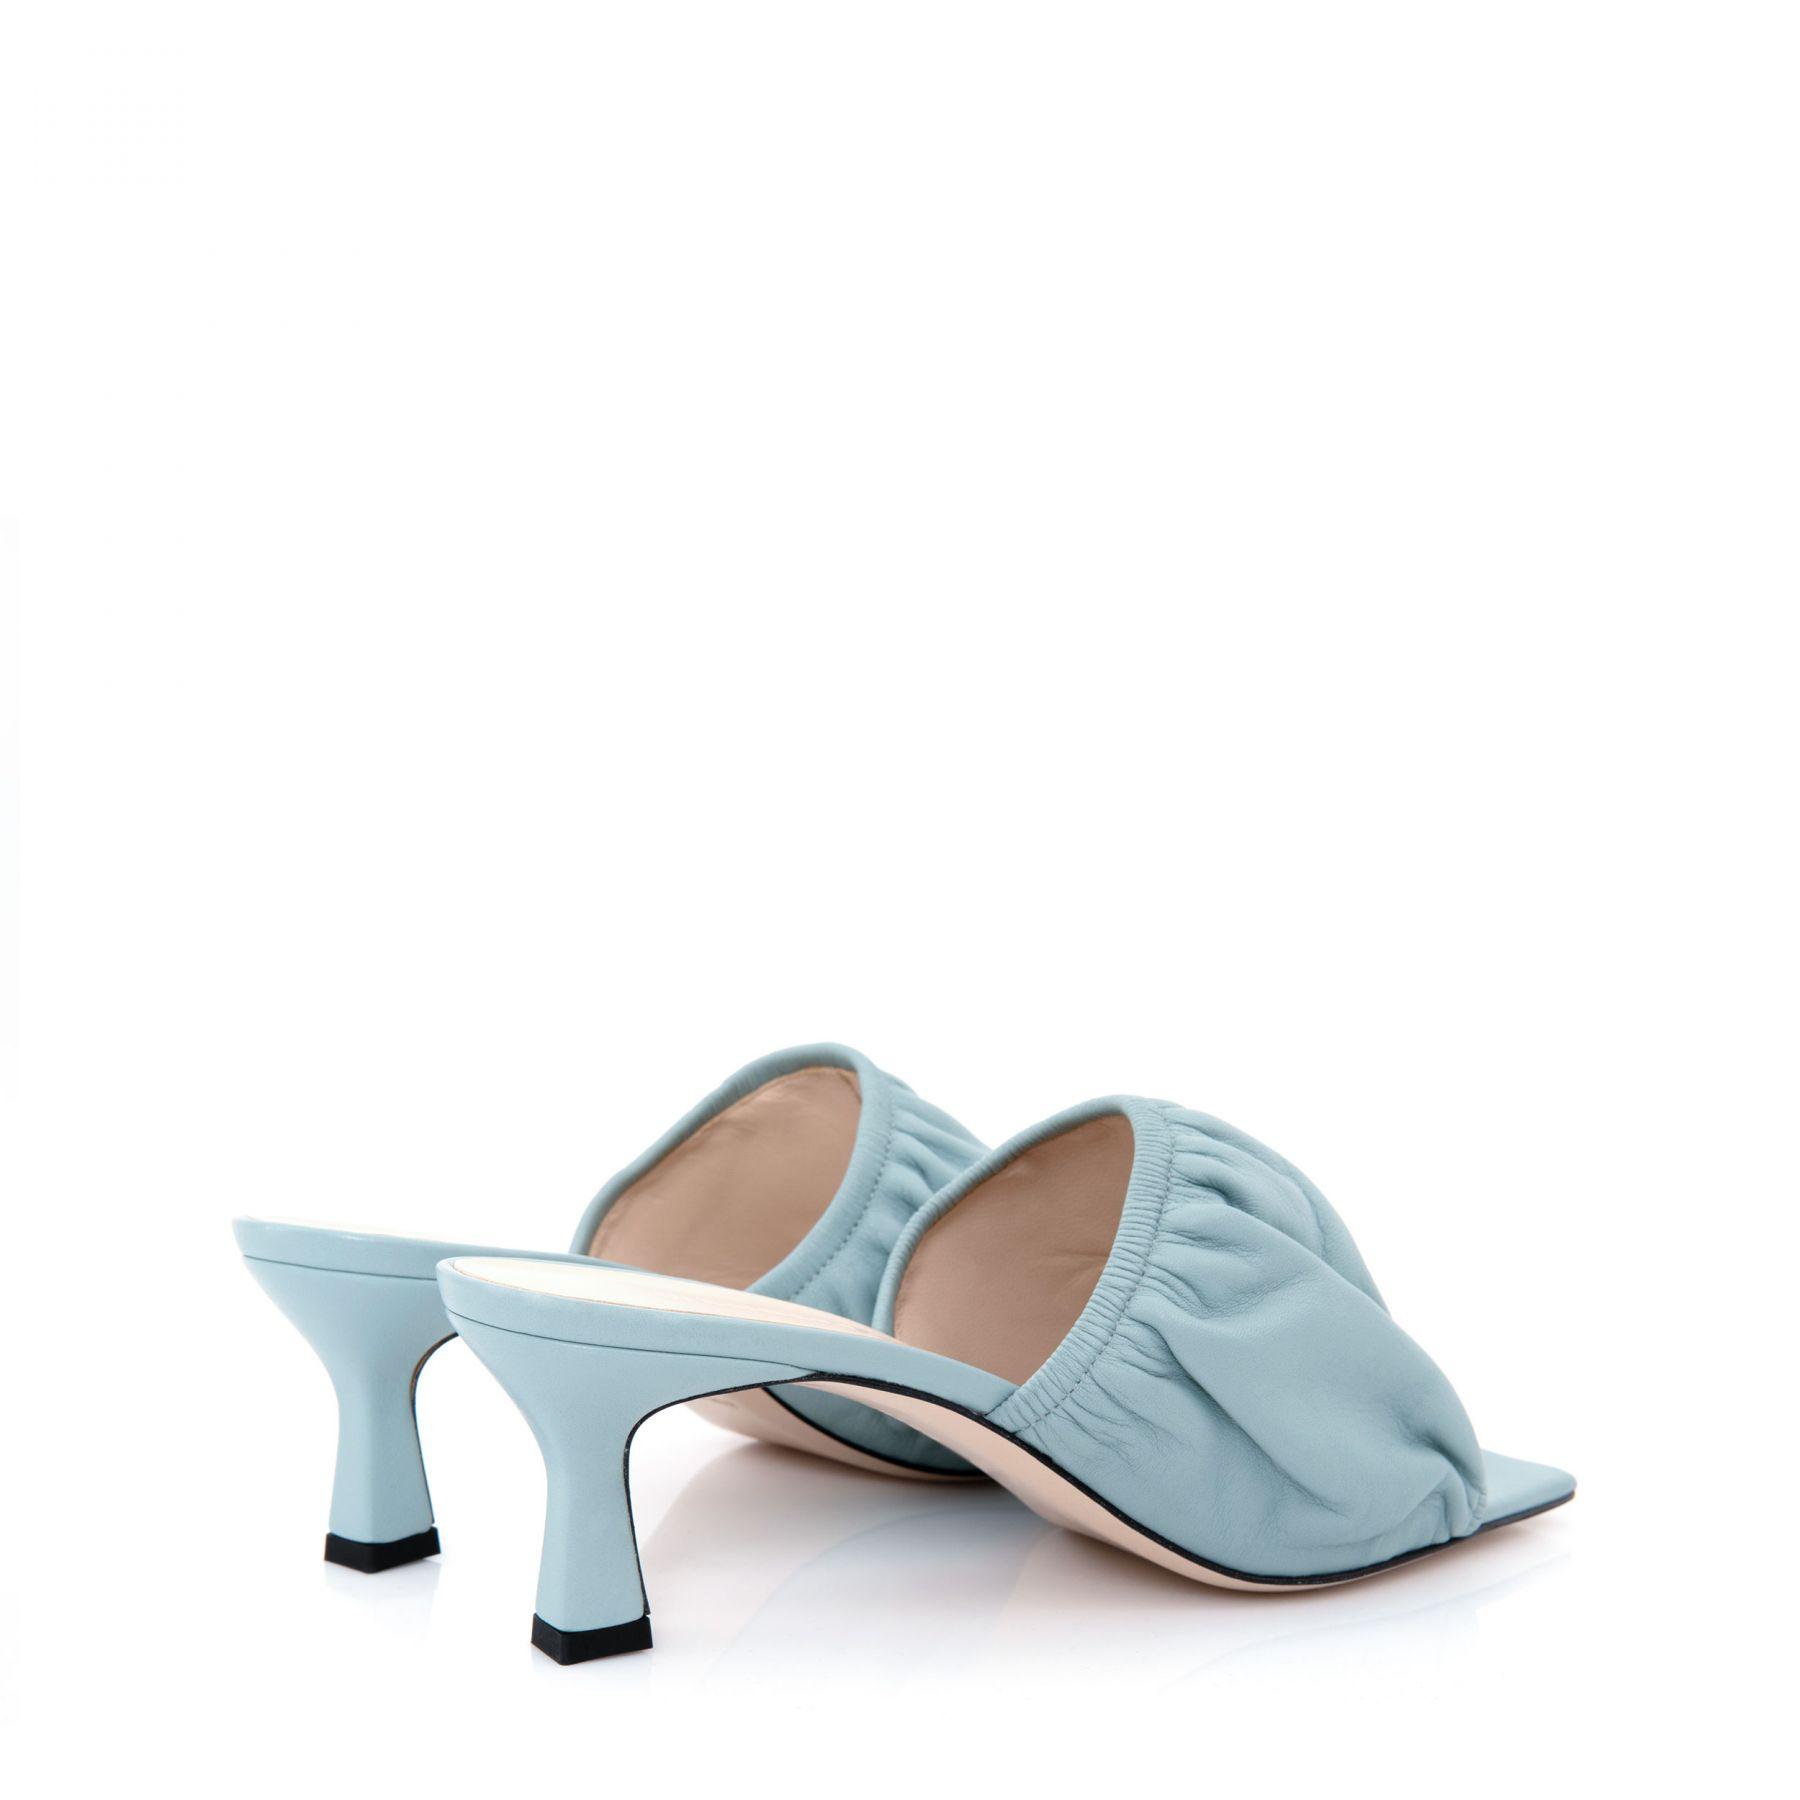 Мюли Wandler Ava голубые